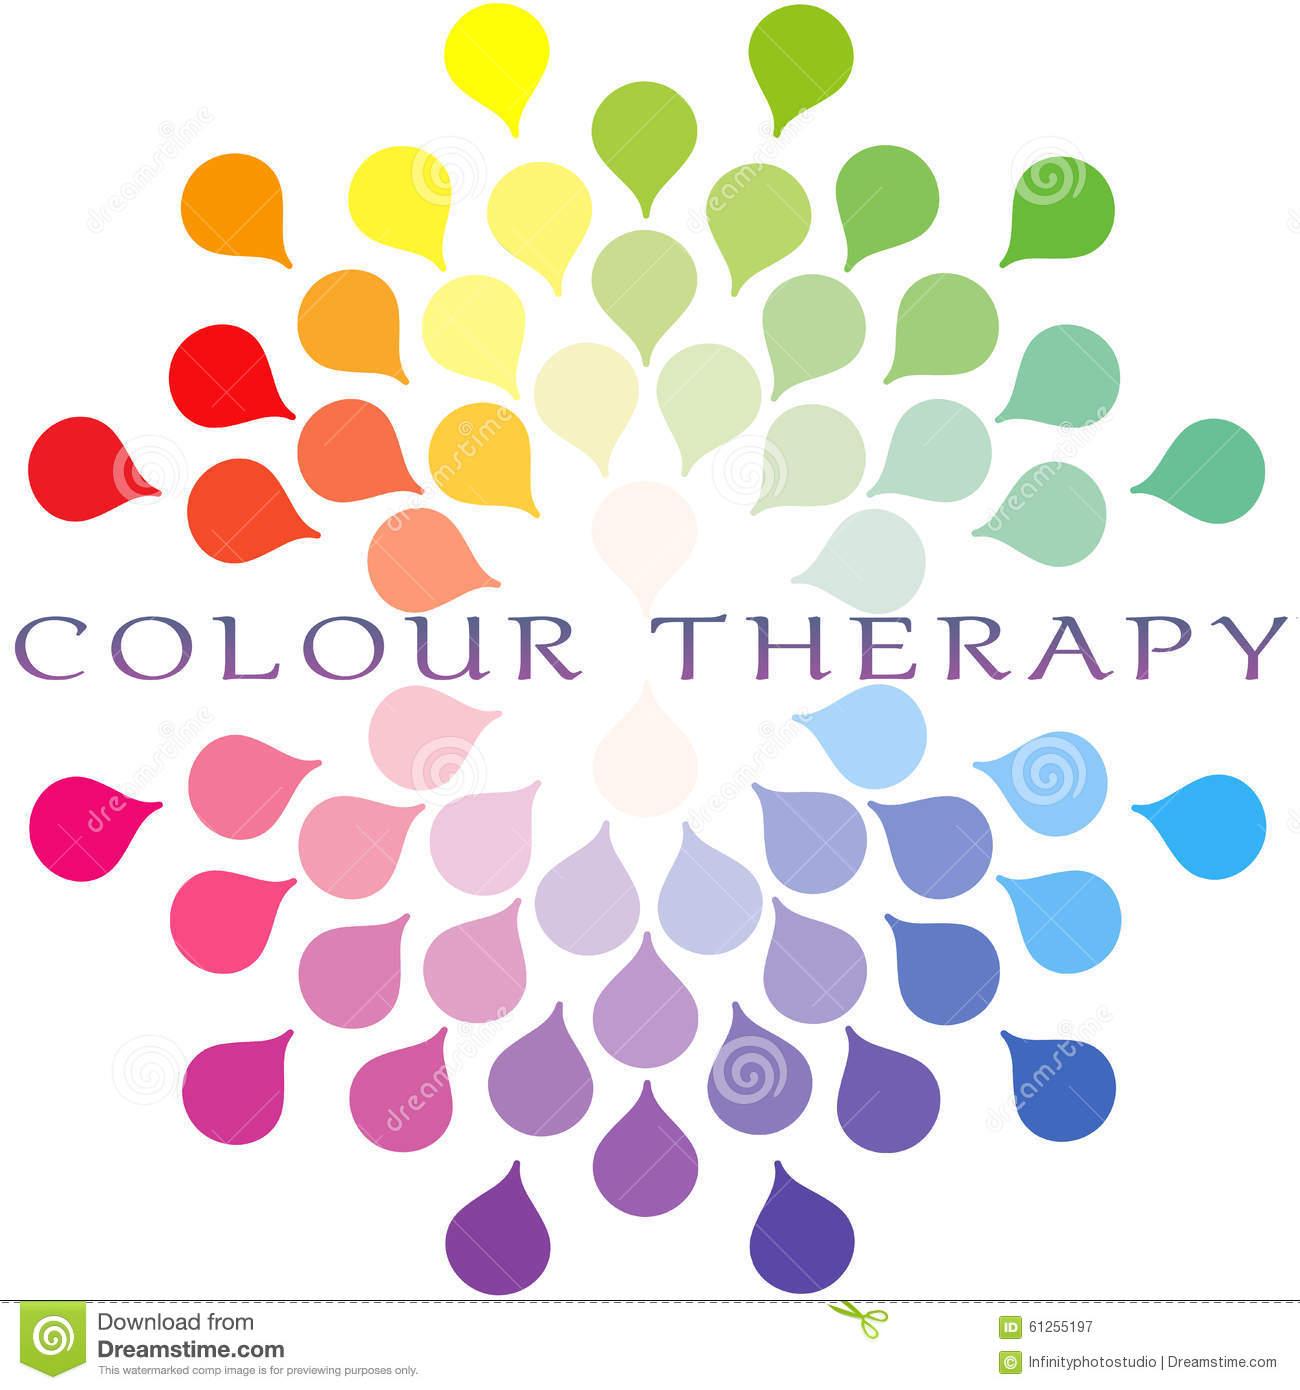 Colour Therapy.